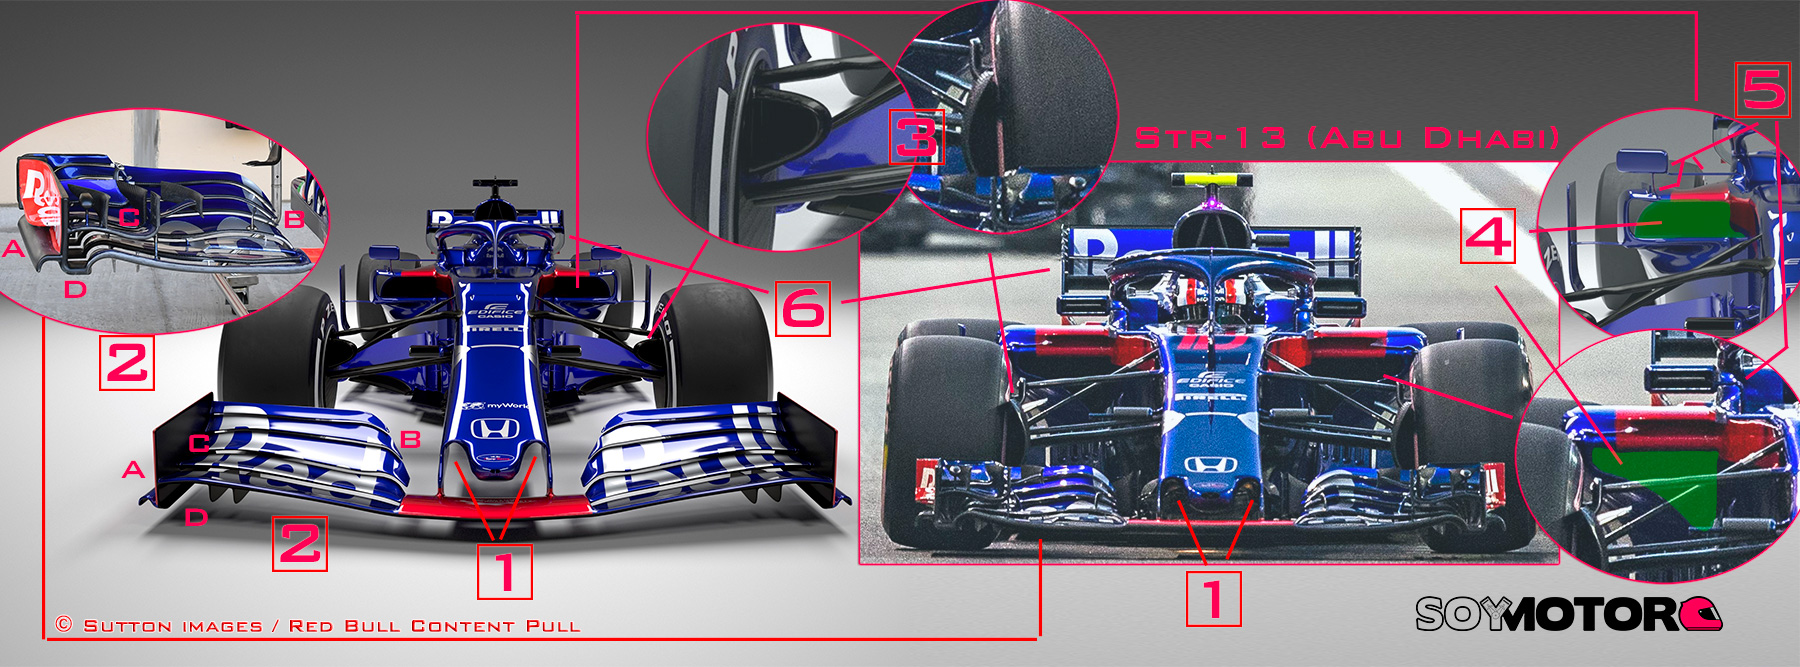 toro-rosso-str-14-frontal-soymotor.jpg